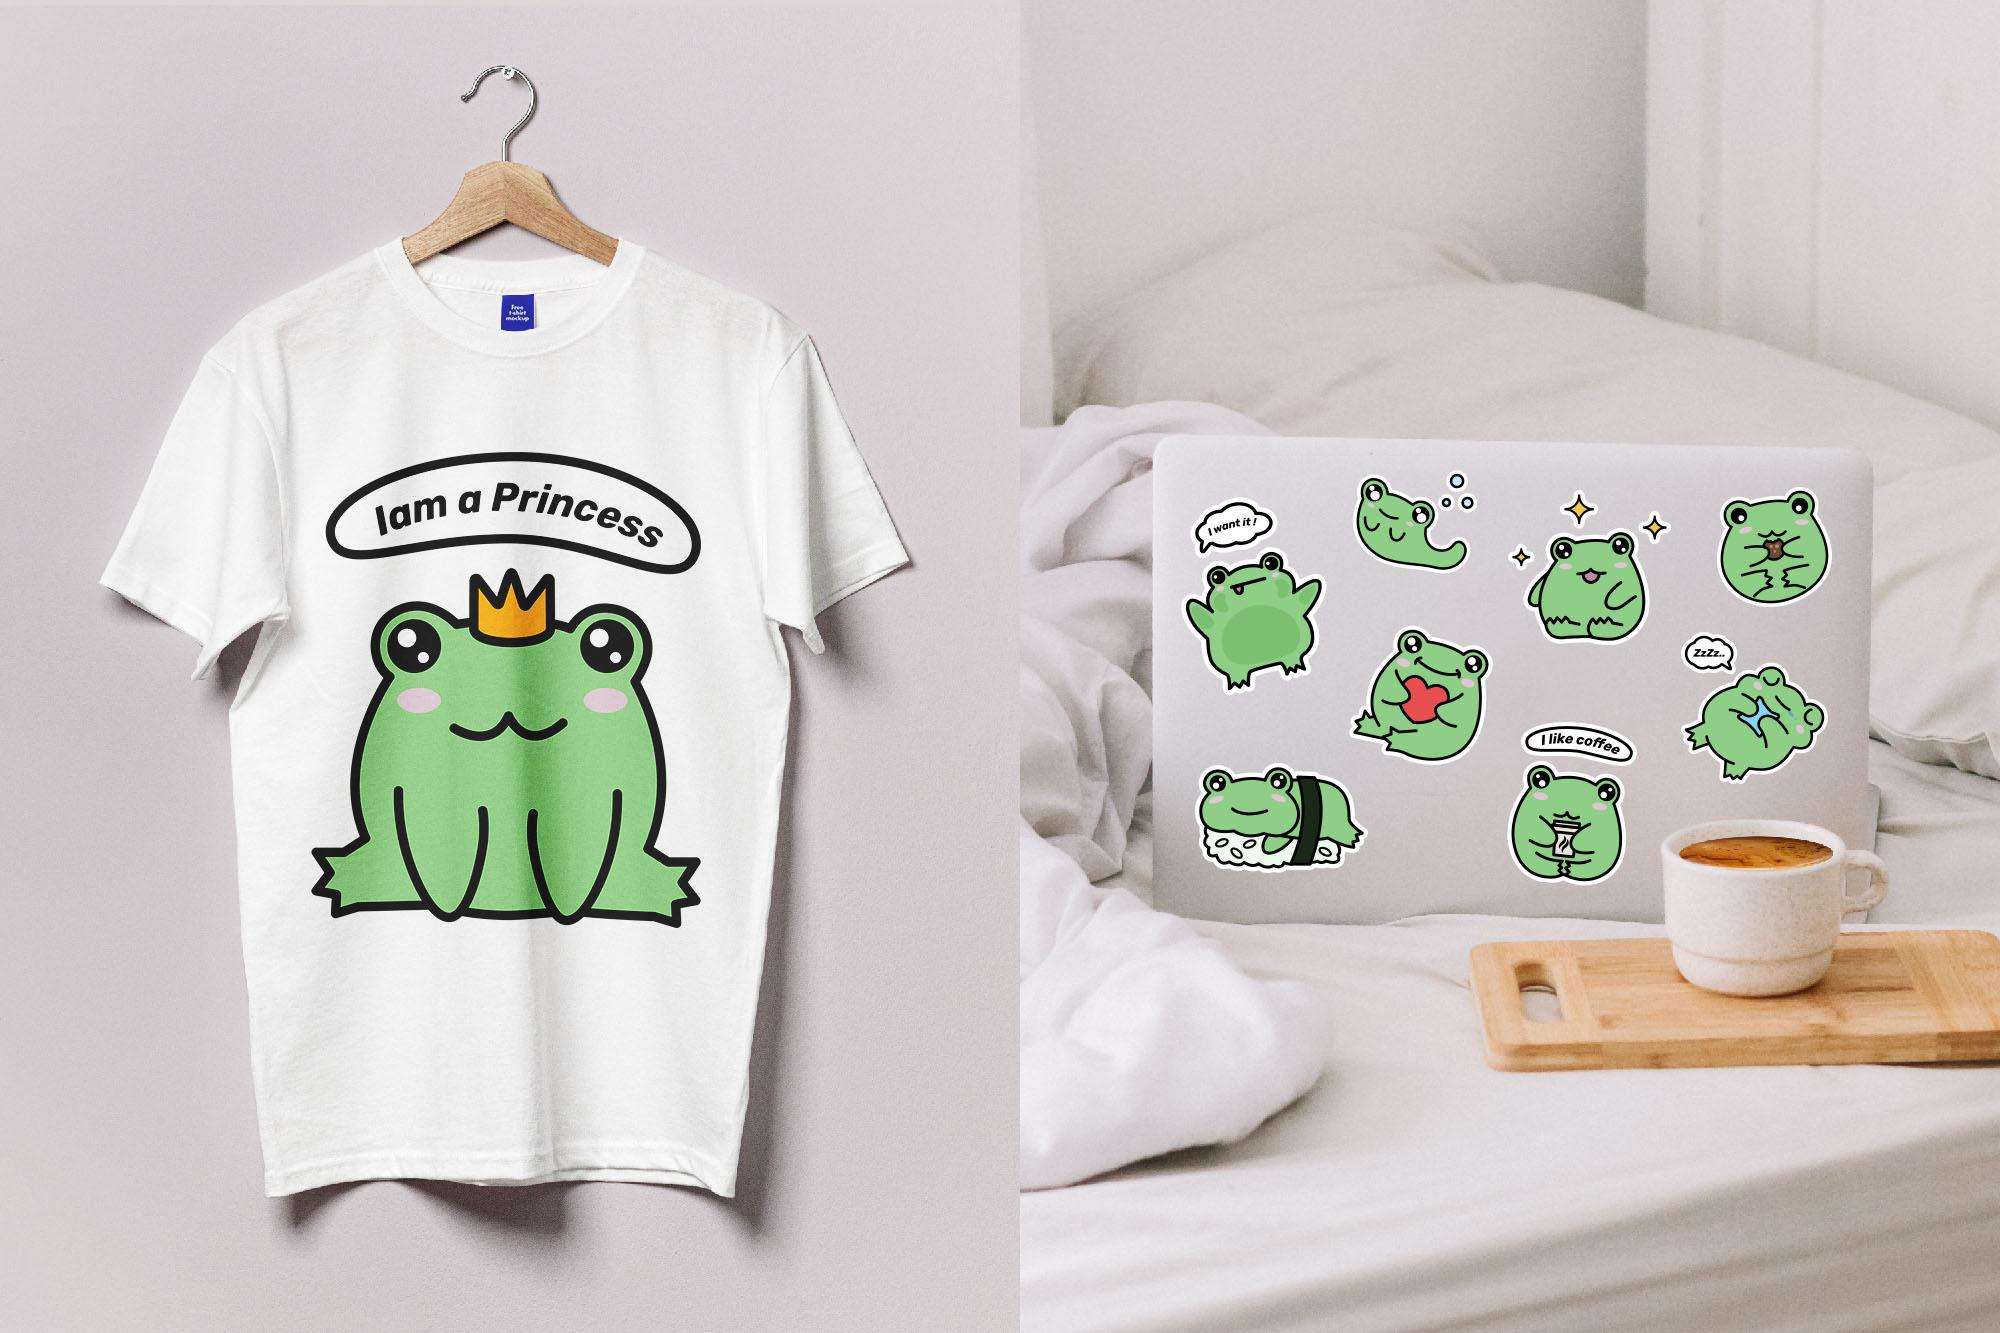 cute frog illustration on t-shirt.